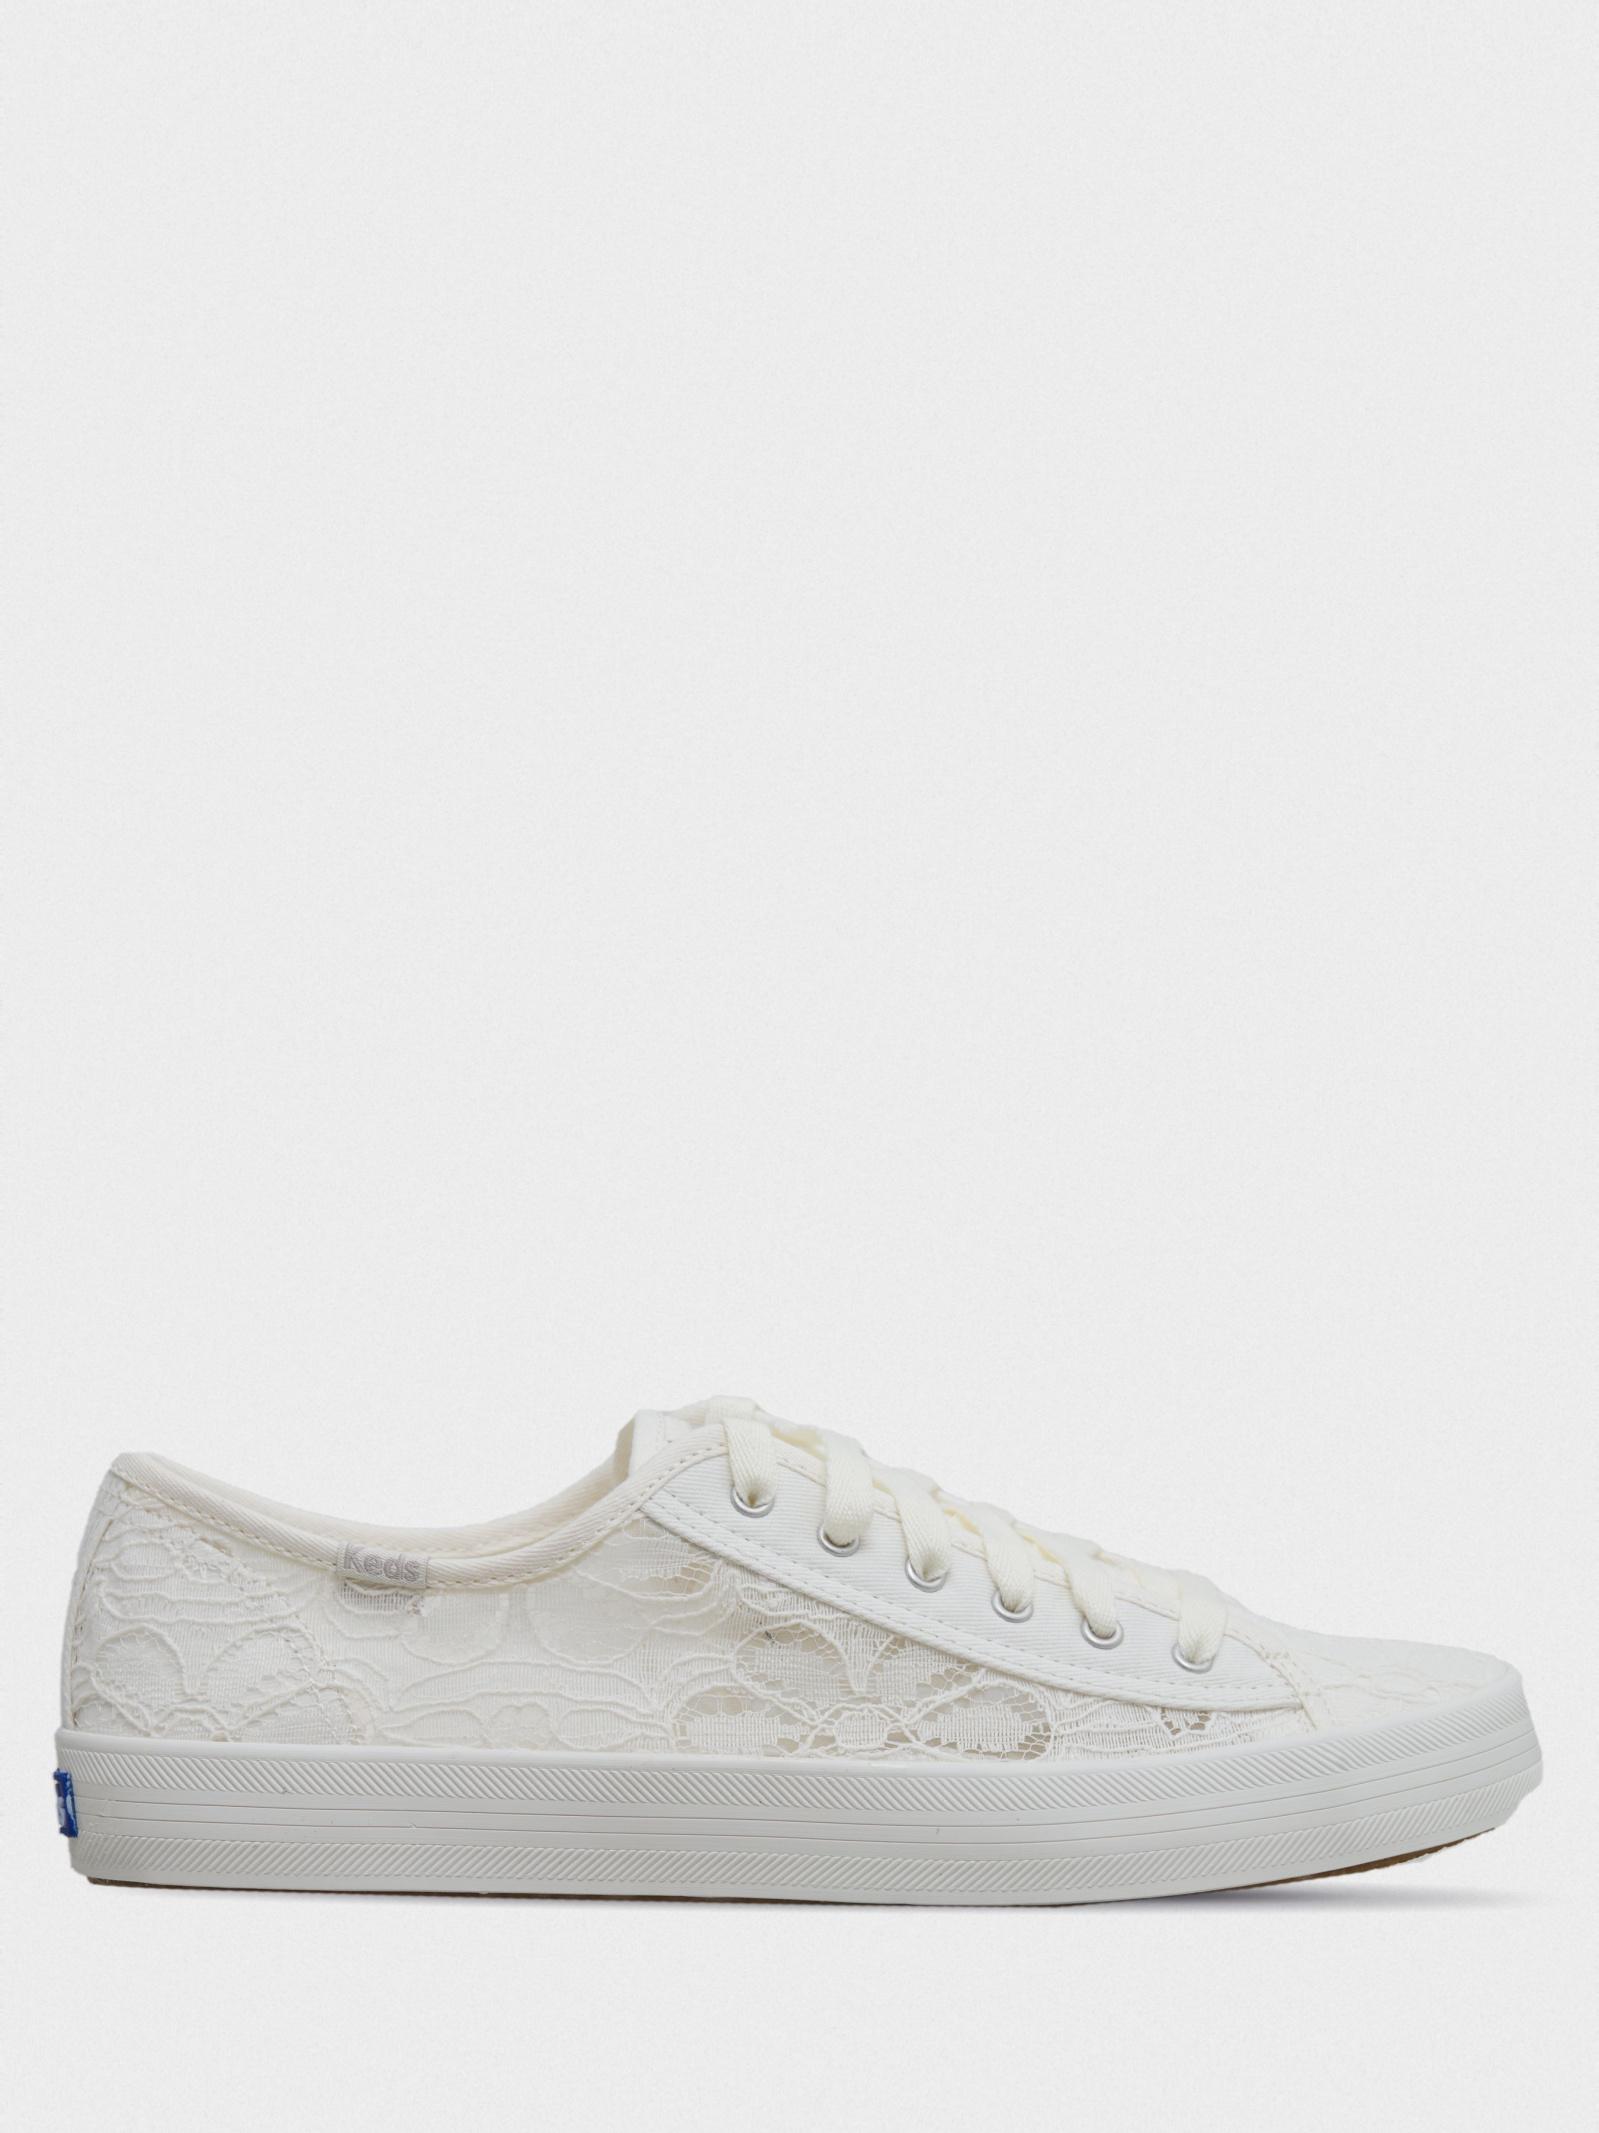 Кеды для женщин KEDS KICKSTART FESTIVAL FLORAL KD336 цена обуви, 2017